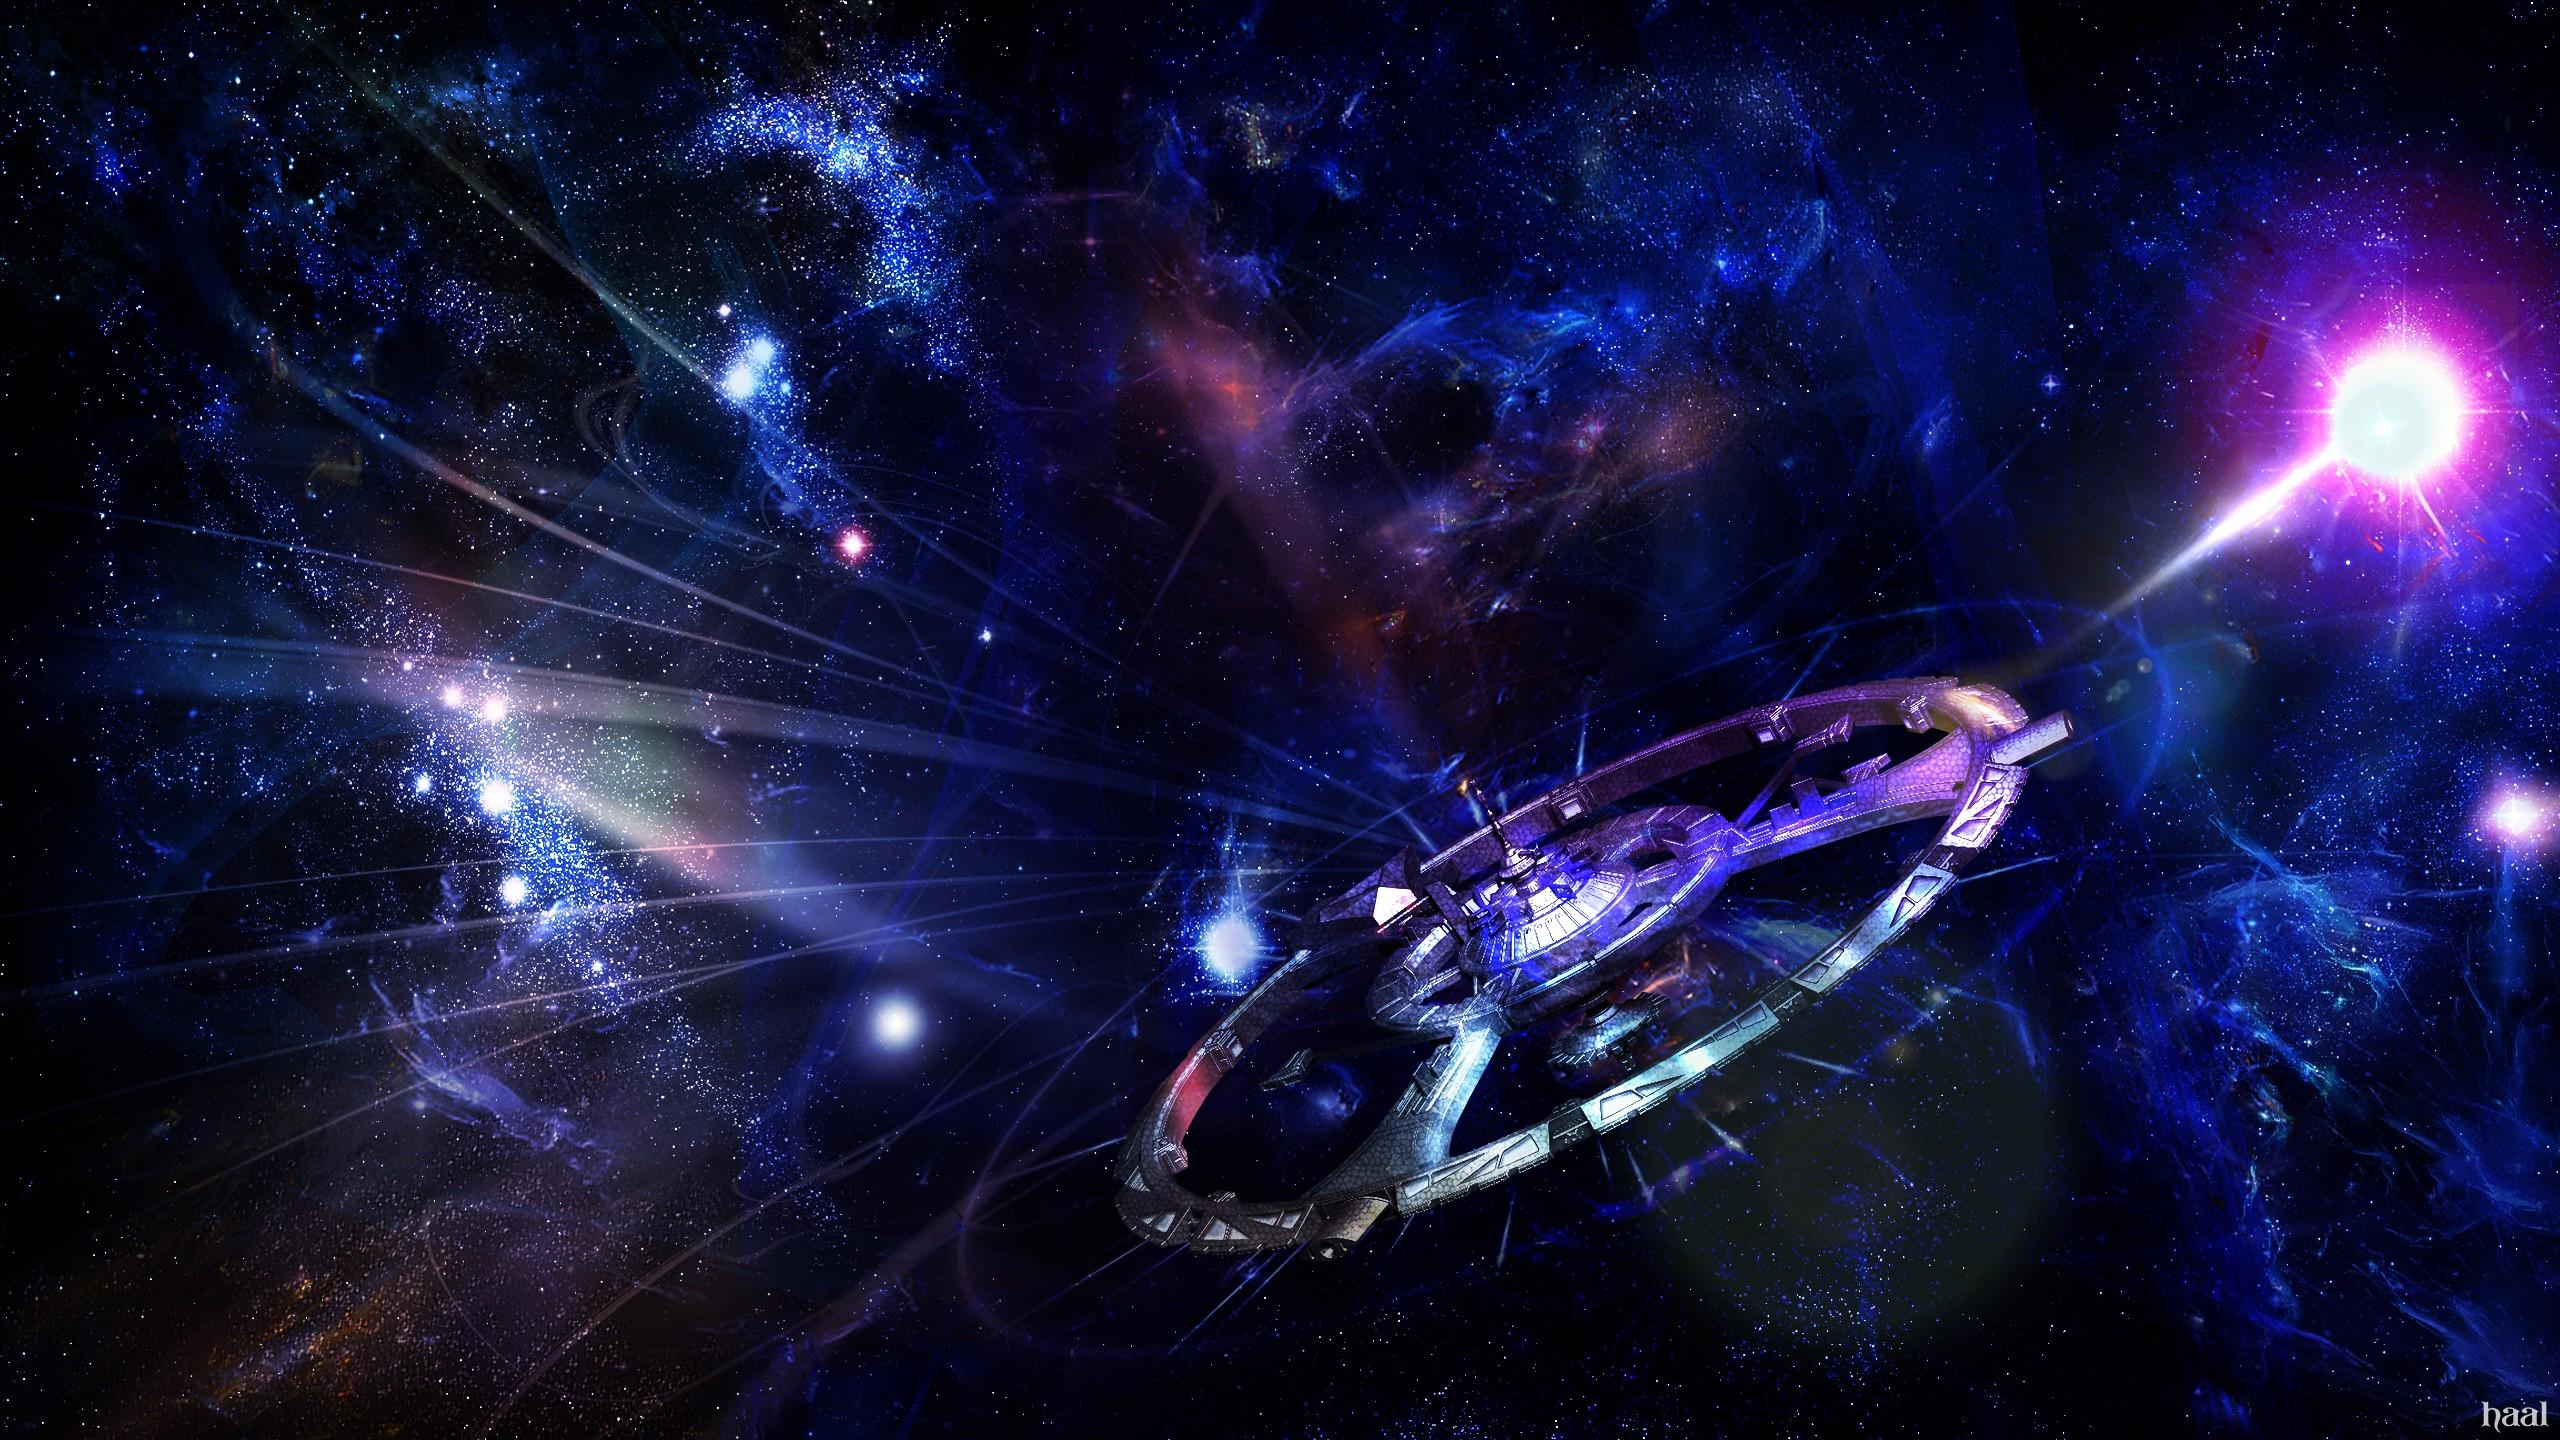 Sci Fi Wallpaper 2560x1440: Spaceship HD Wallpaper